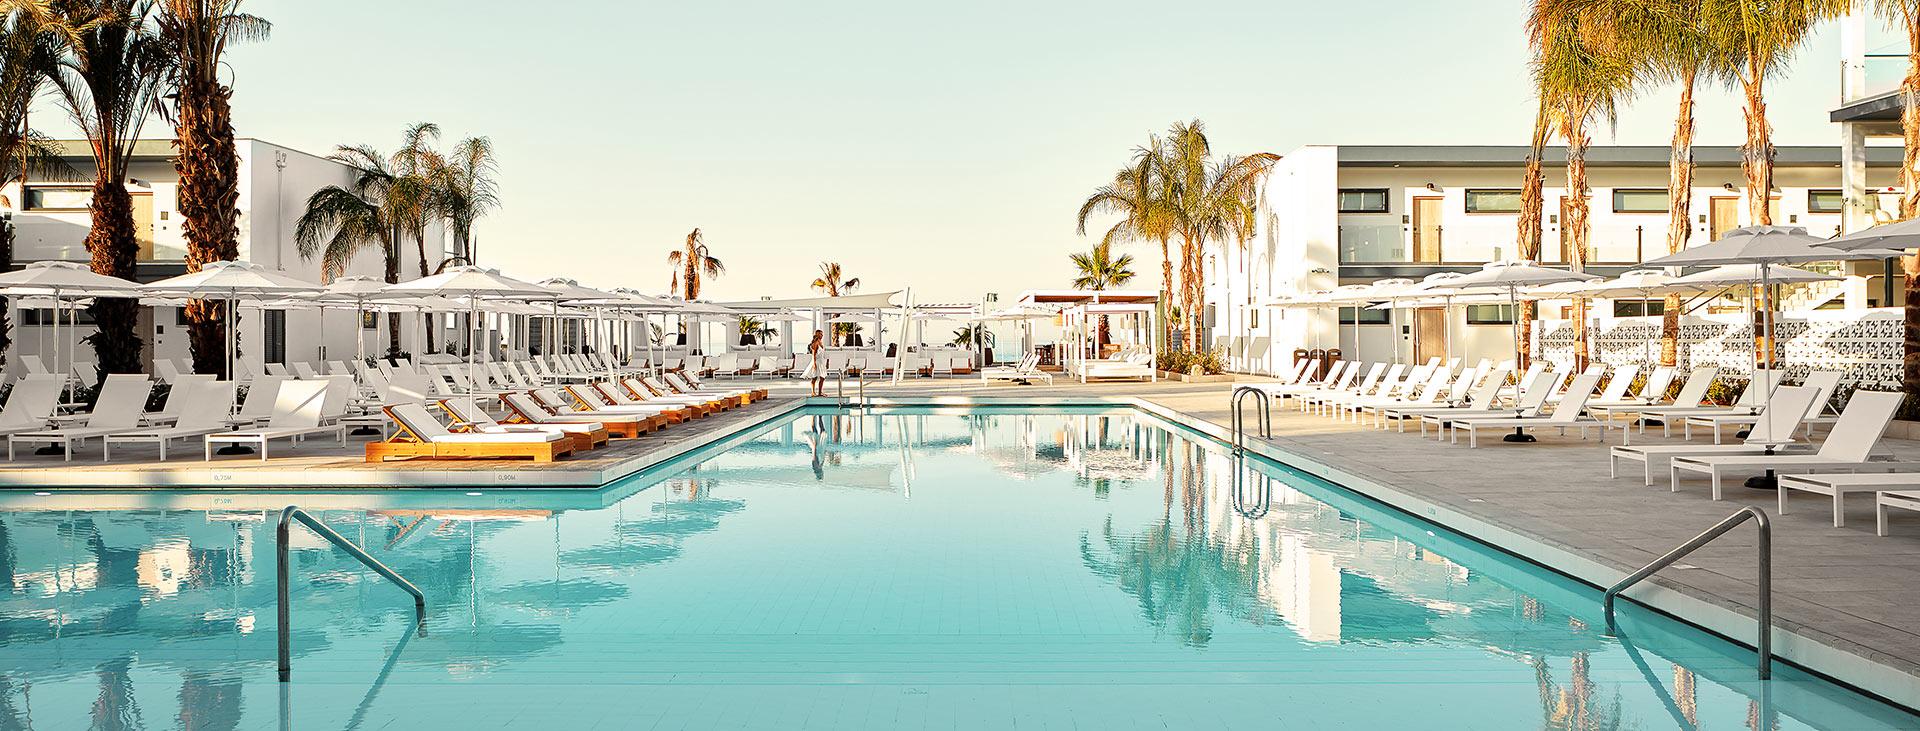 Ocean Beach Club - Kypros, Ayia Napa, Kypros, Kypros